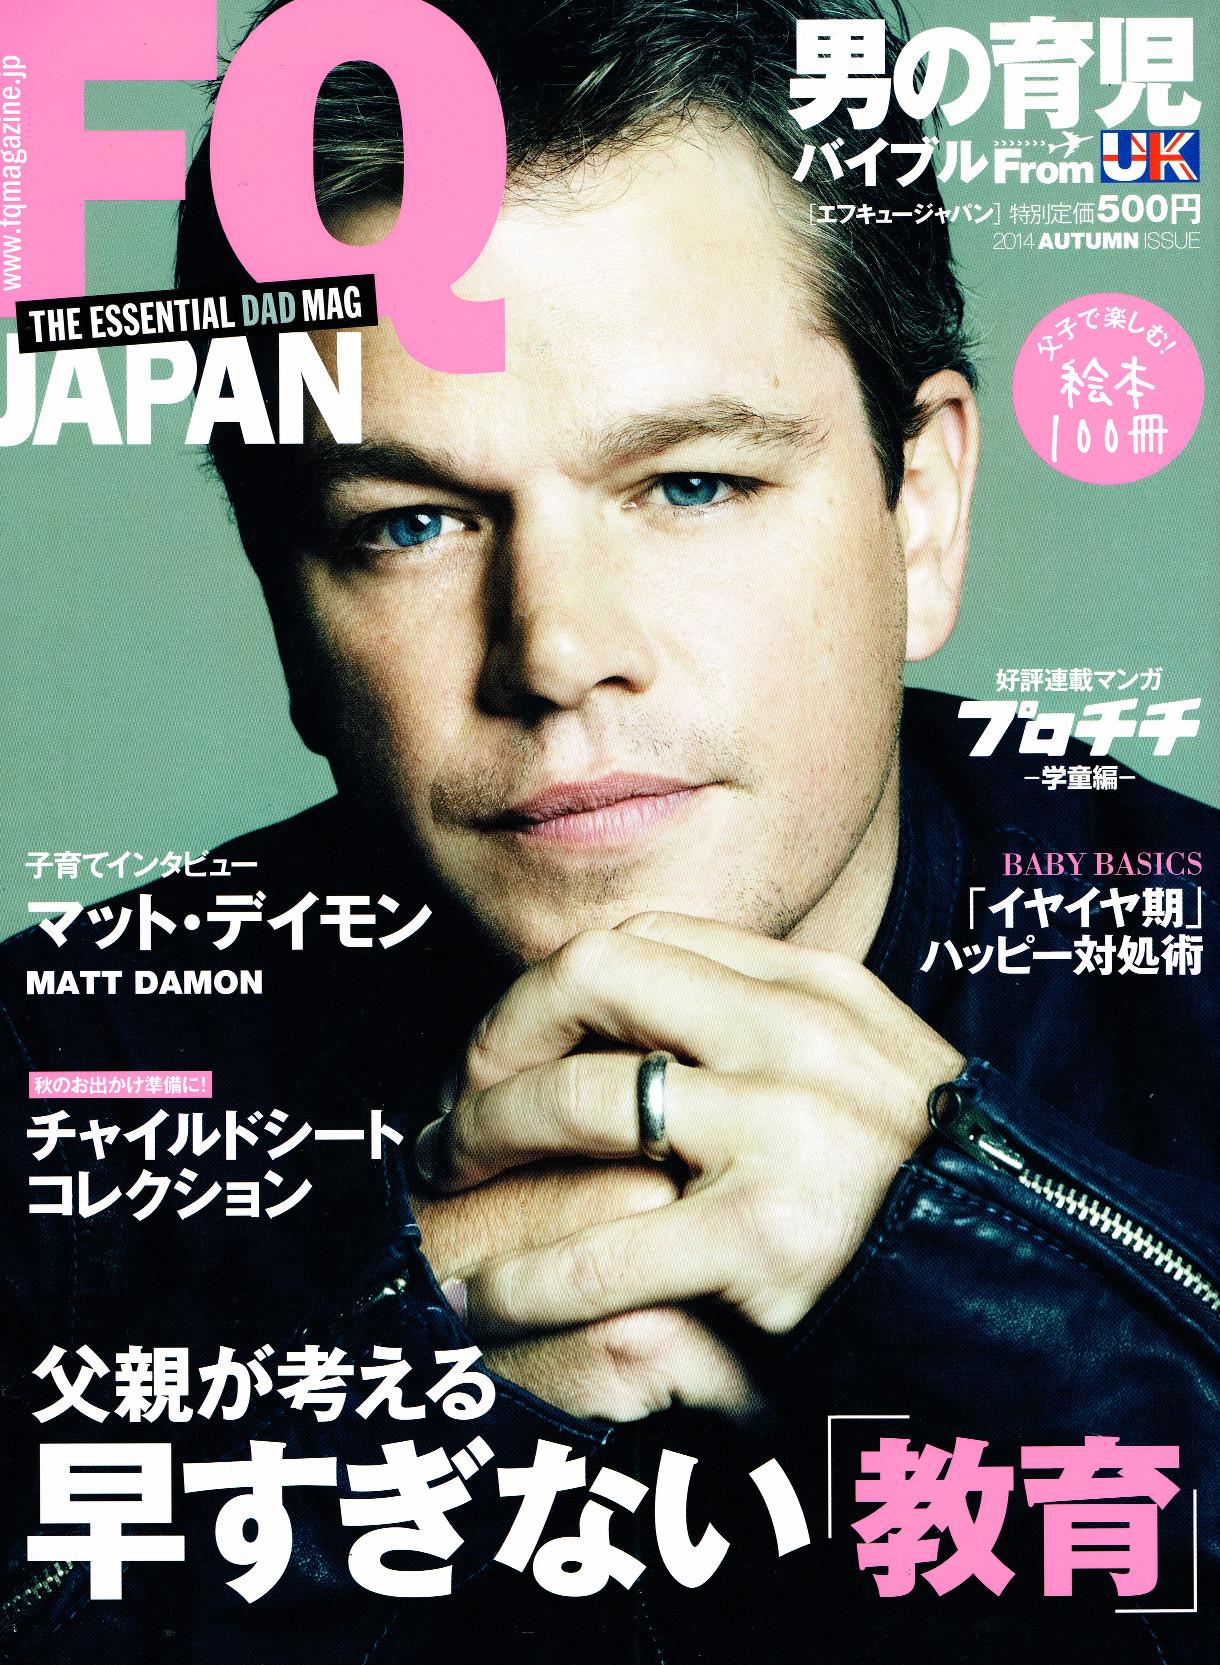 FQ JAPAN 2014年秋号(vol.32)